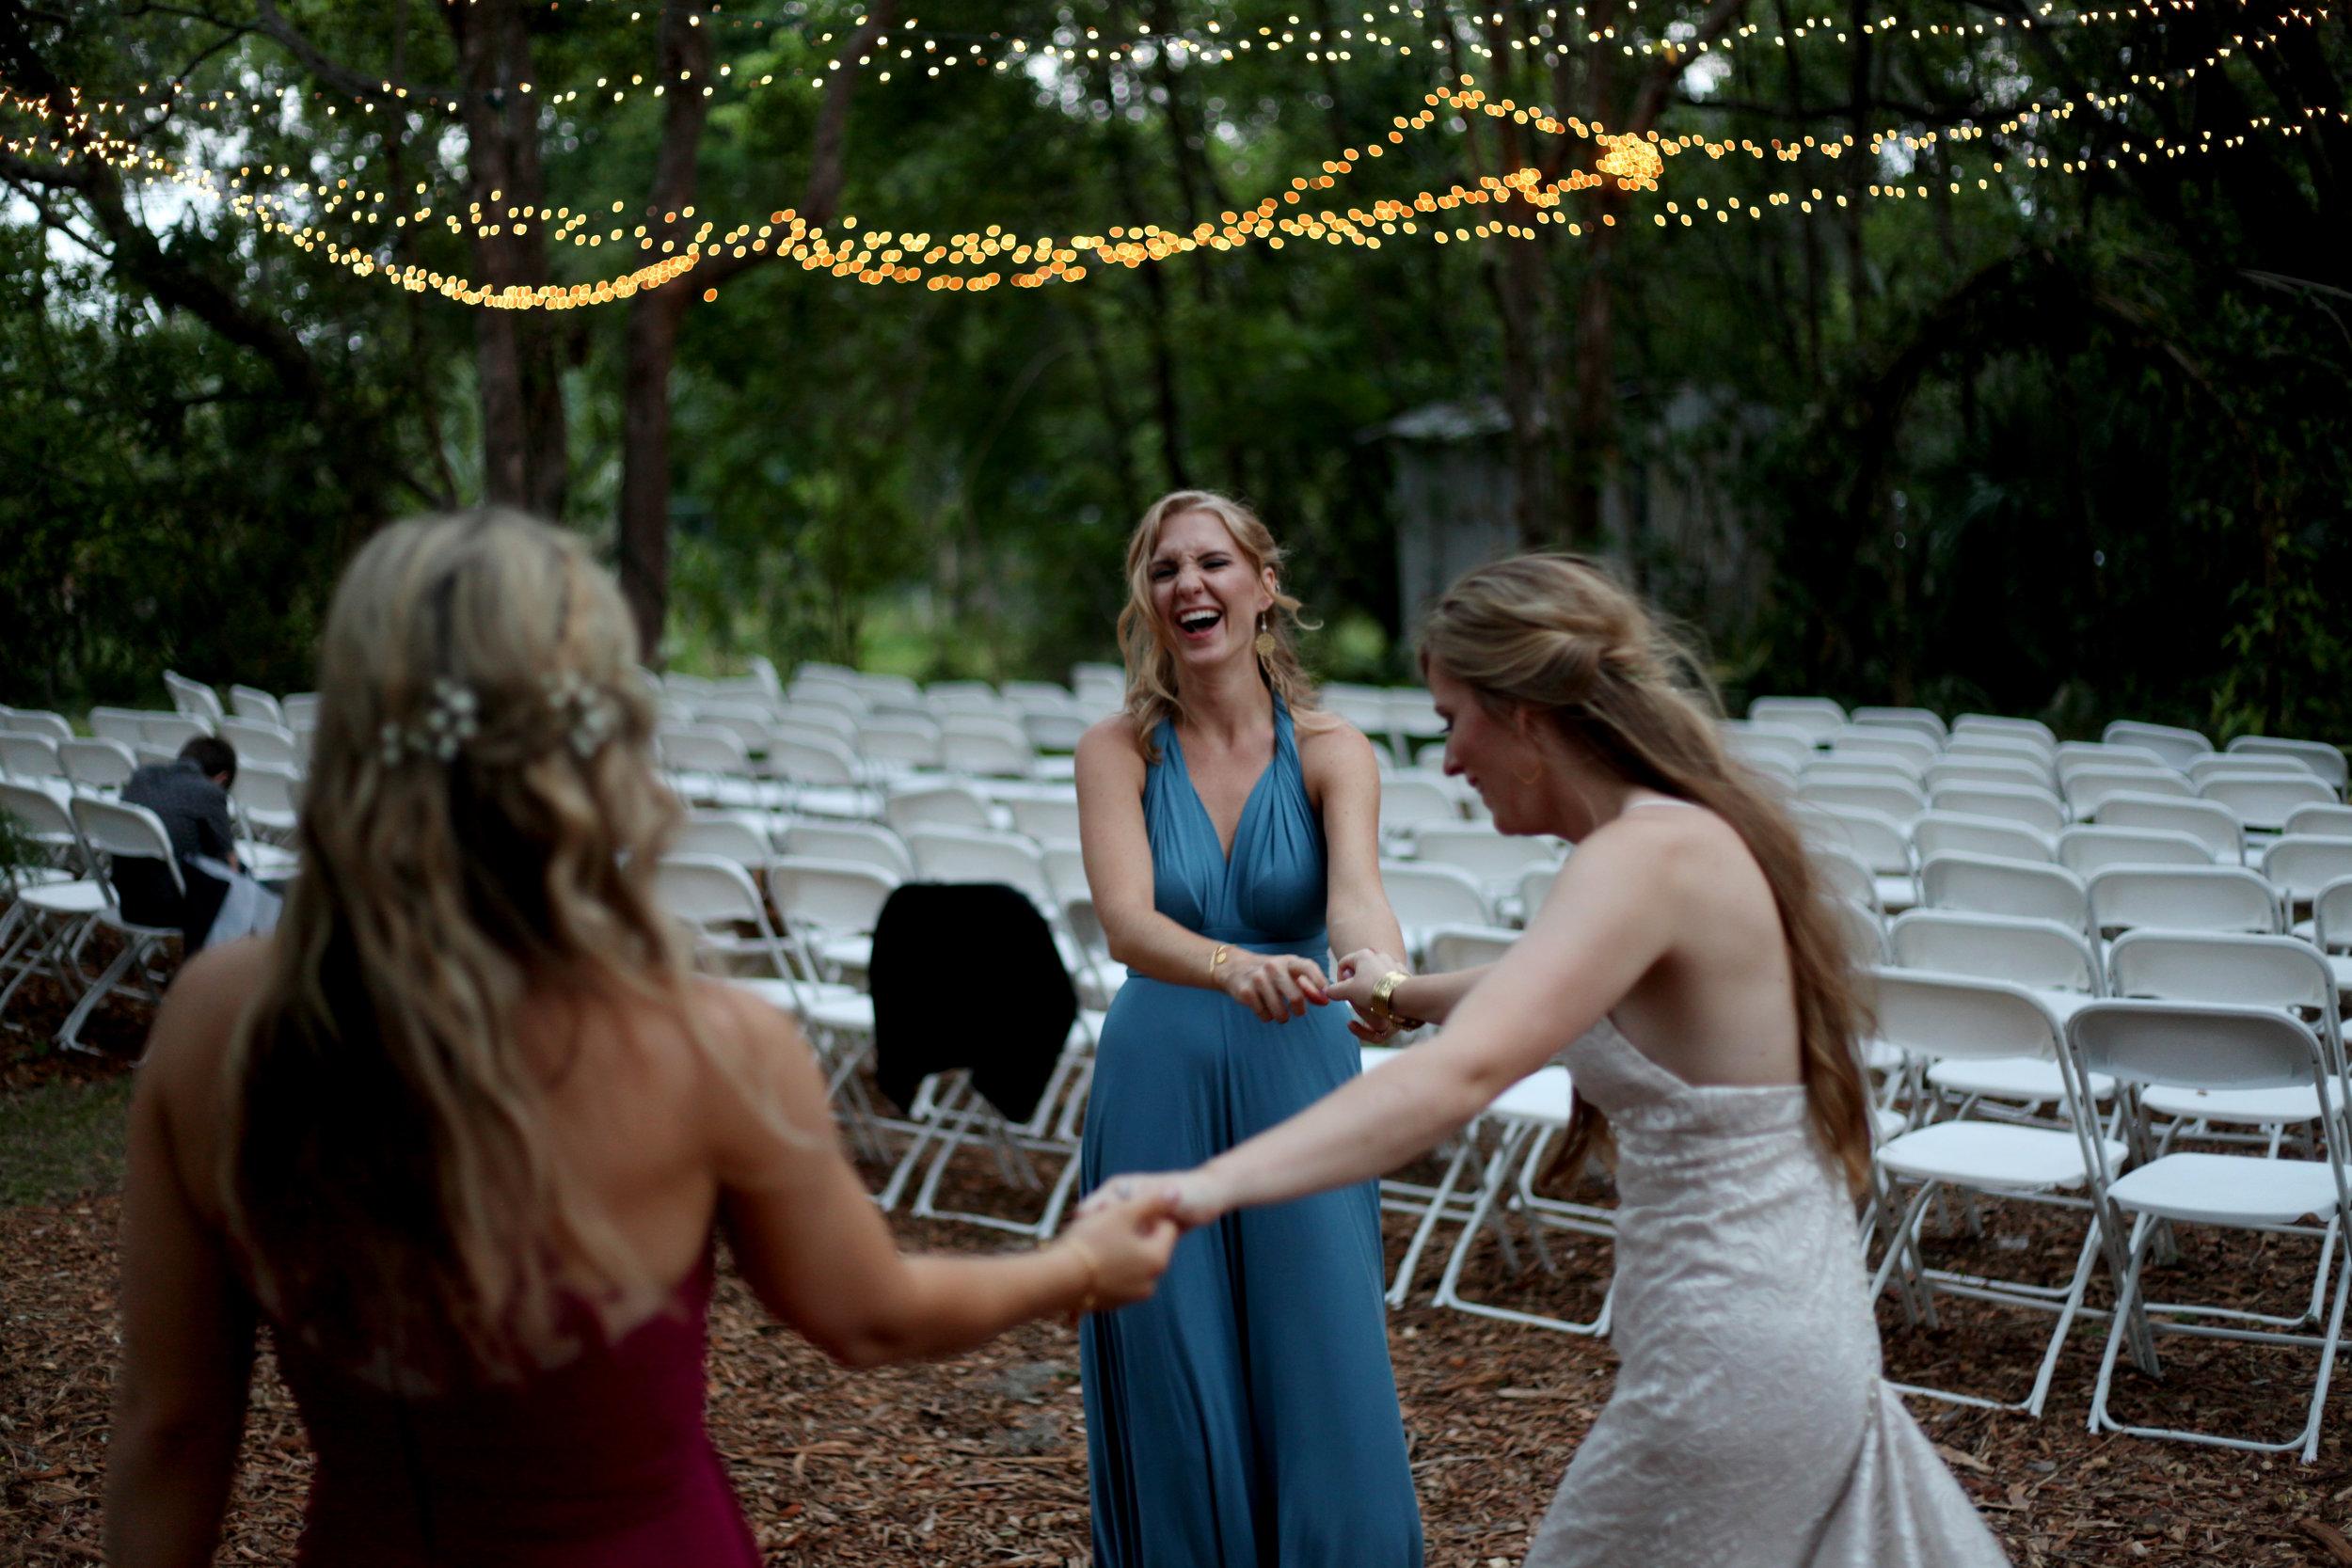 The bridesmaids dance